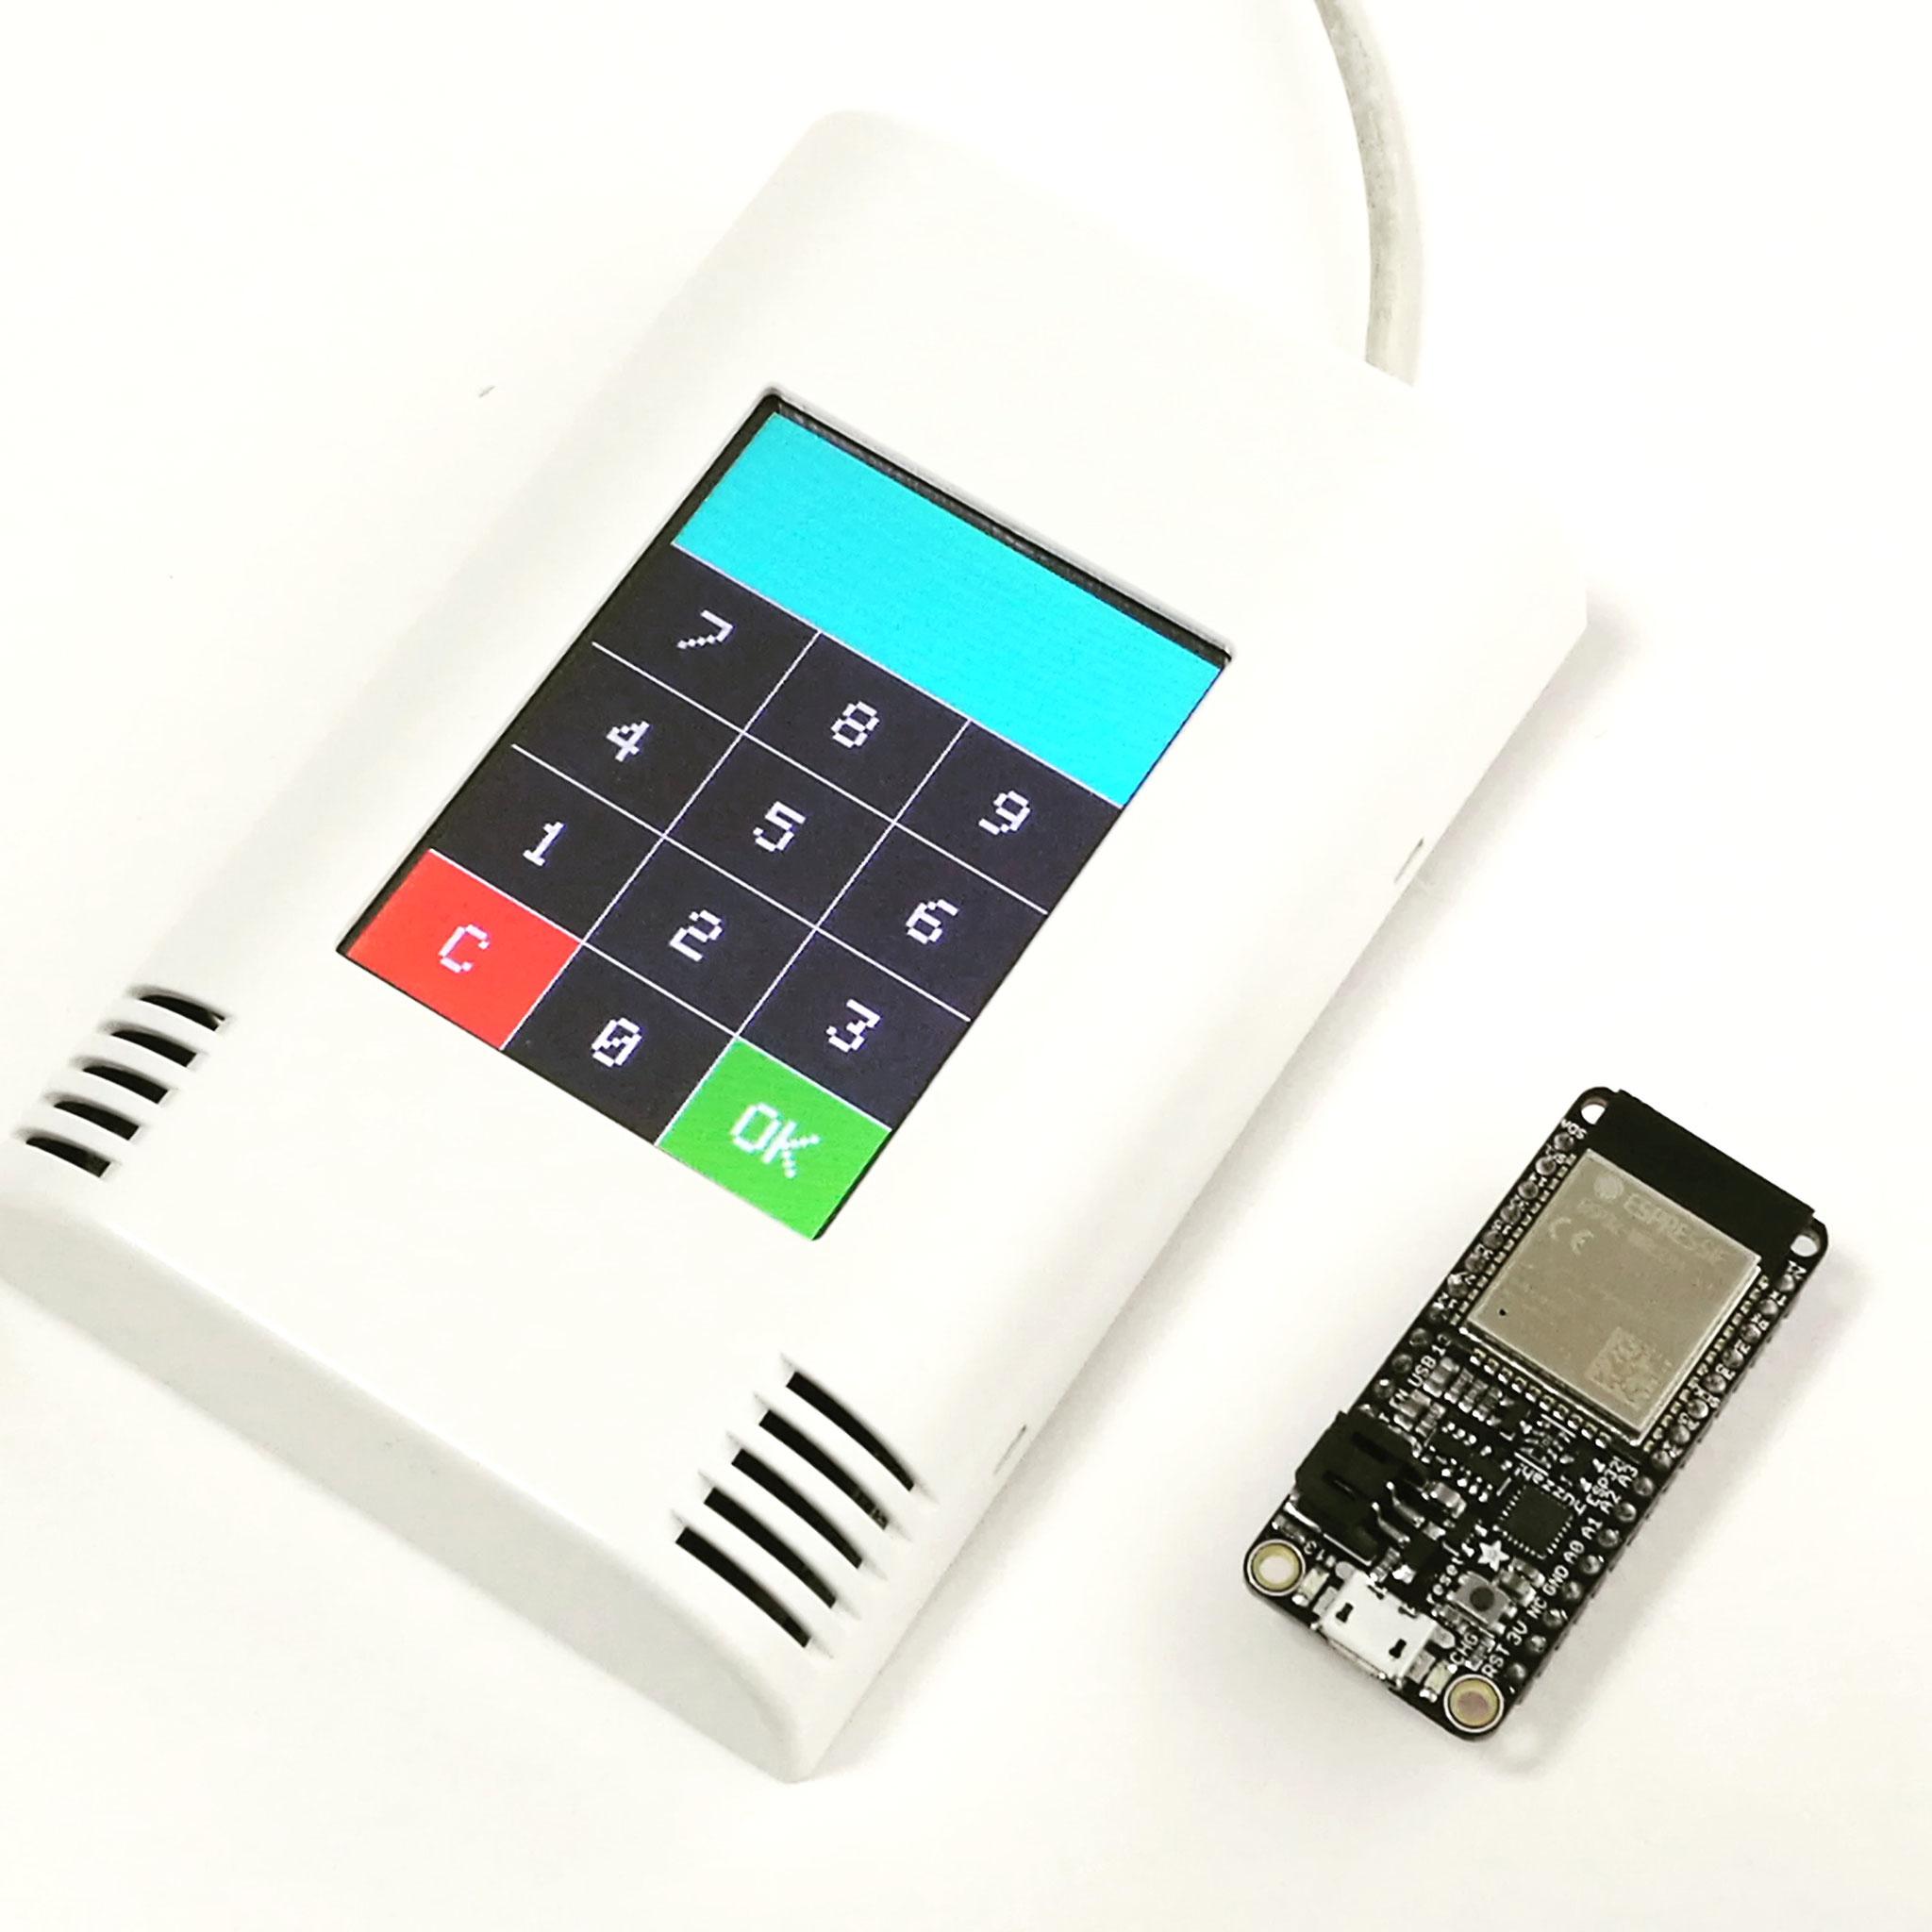 AZ-Touch with Huzzah ESP32 module